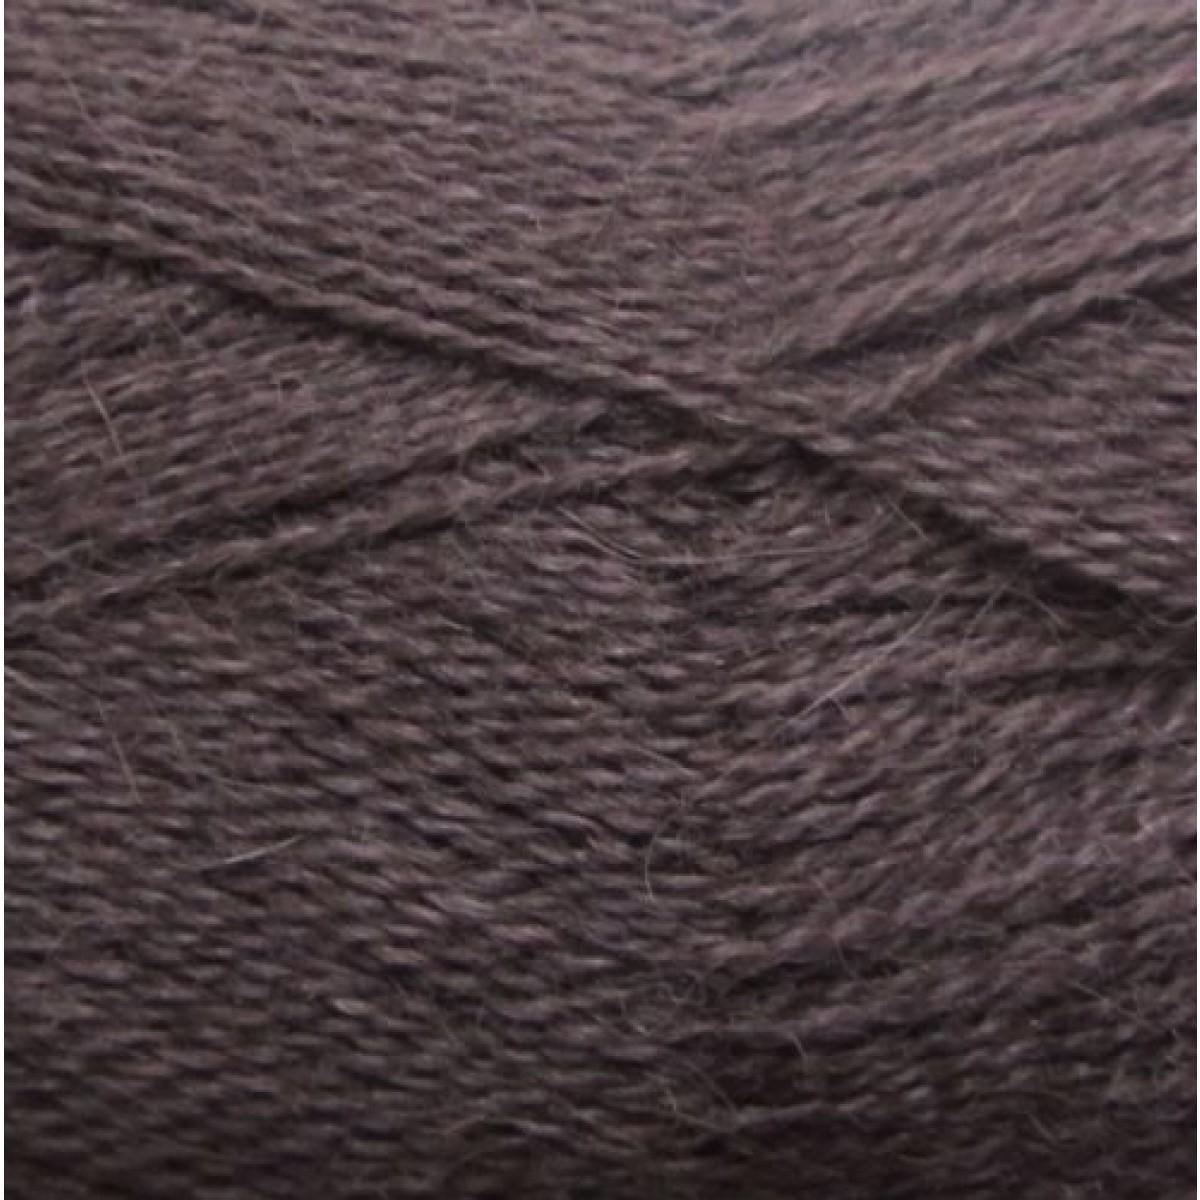 Alaric, hæklet sjal-324